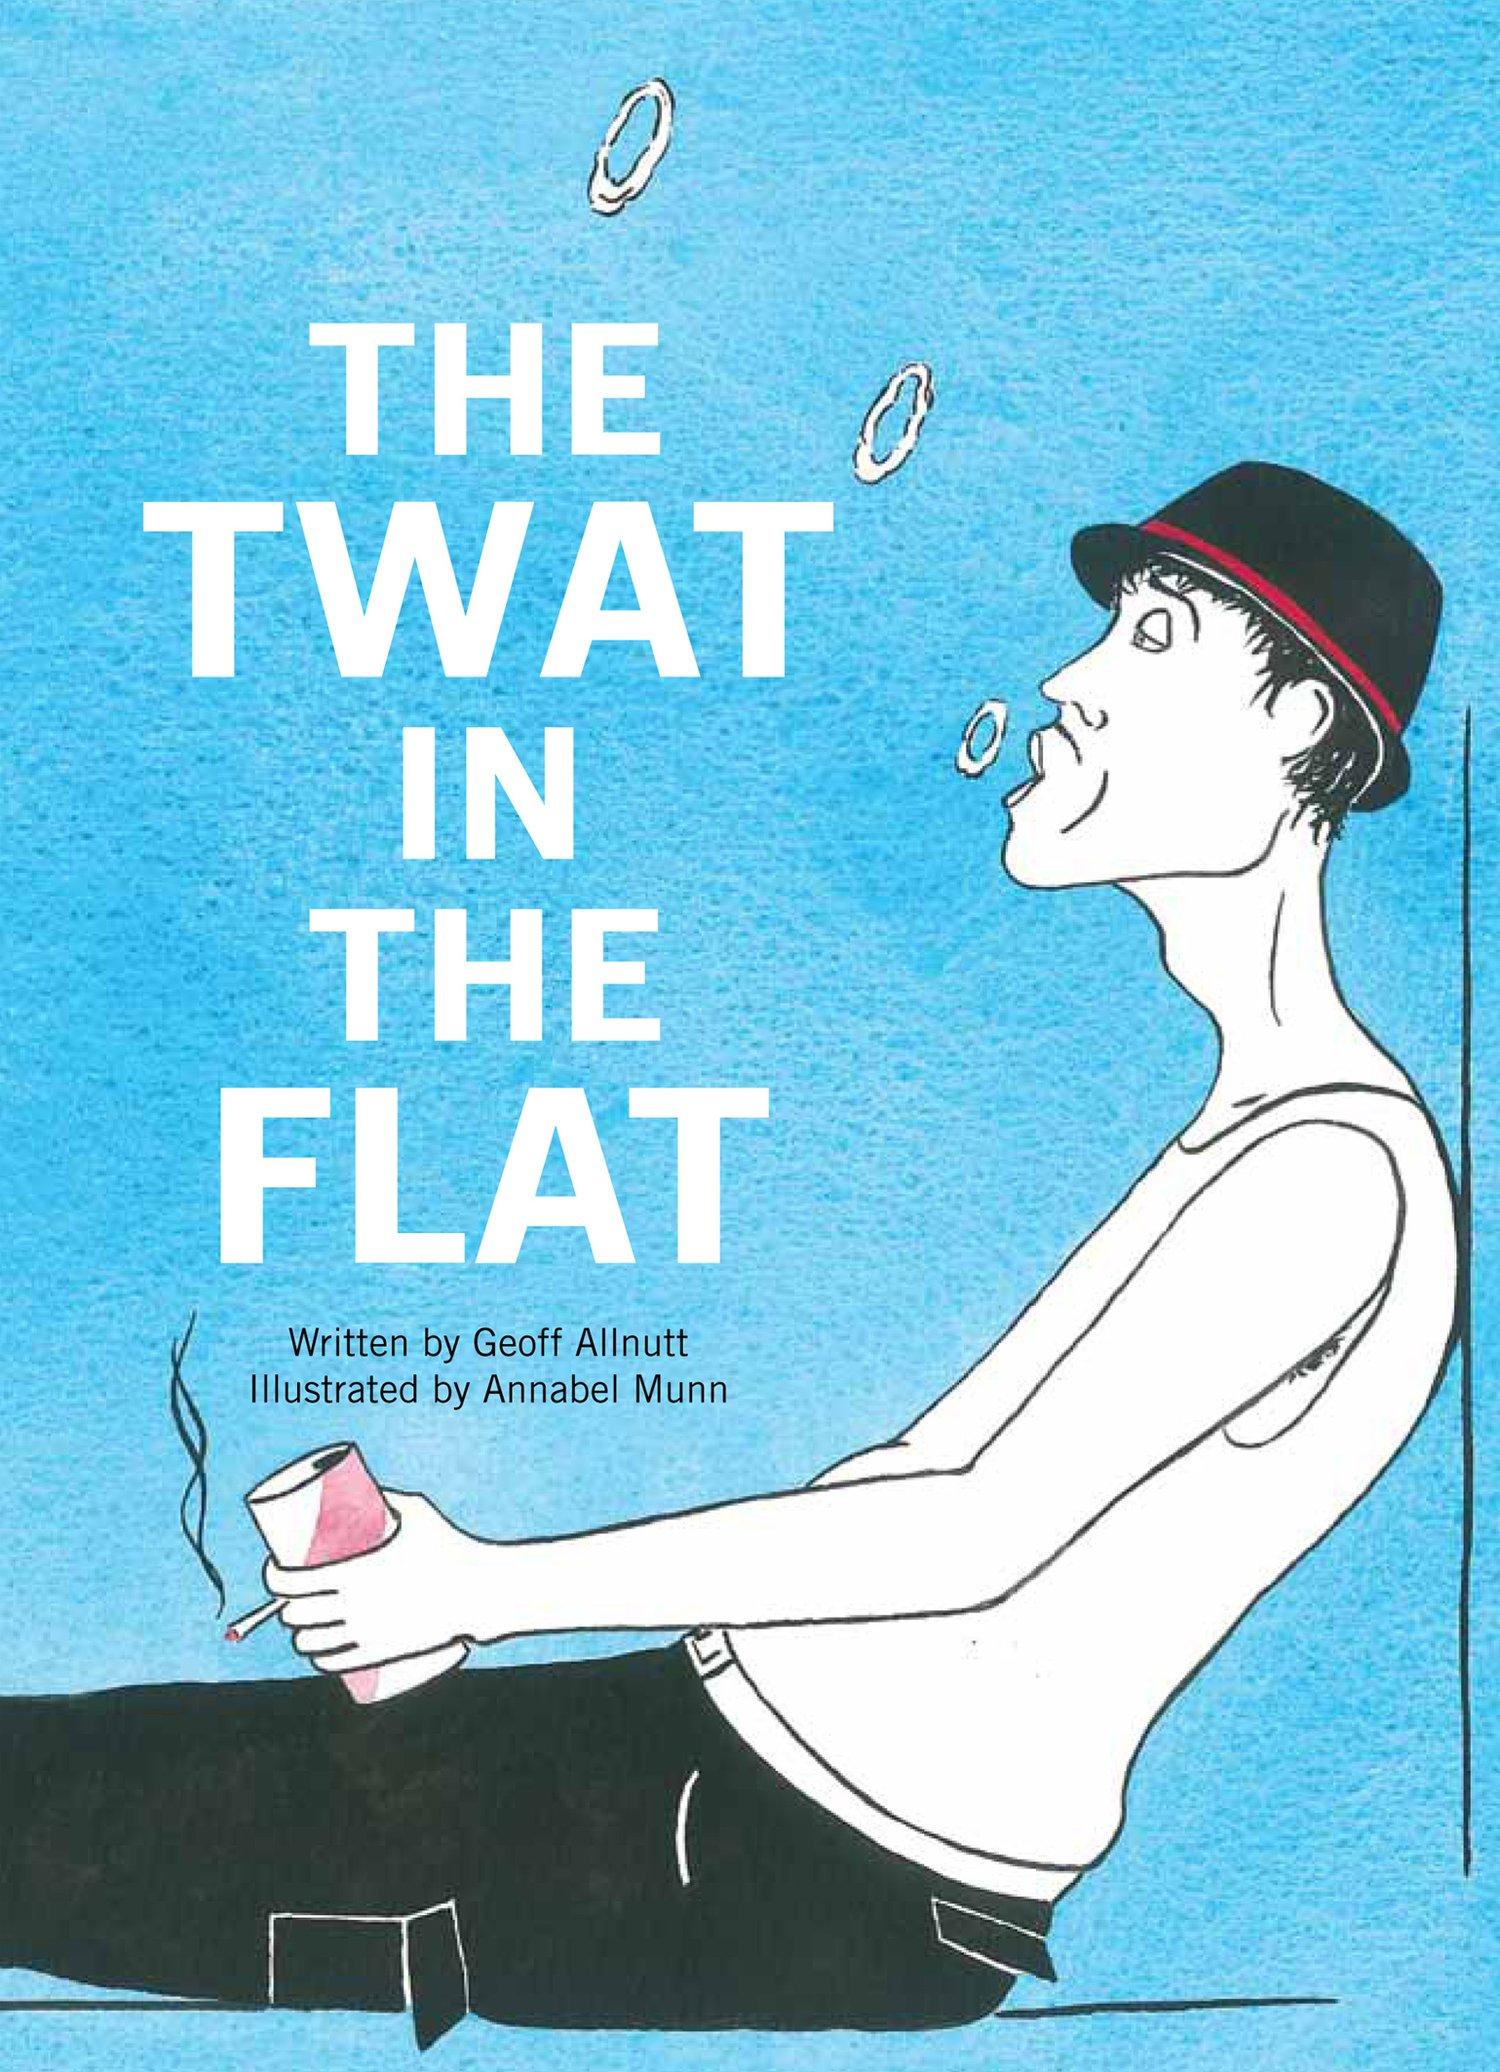 Image of The Twat in the Flat by Geoff Alnutt